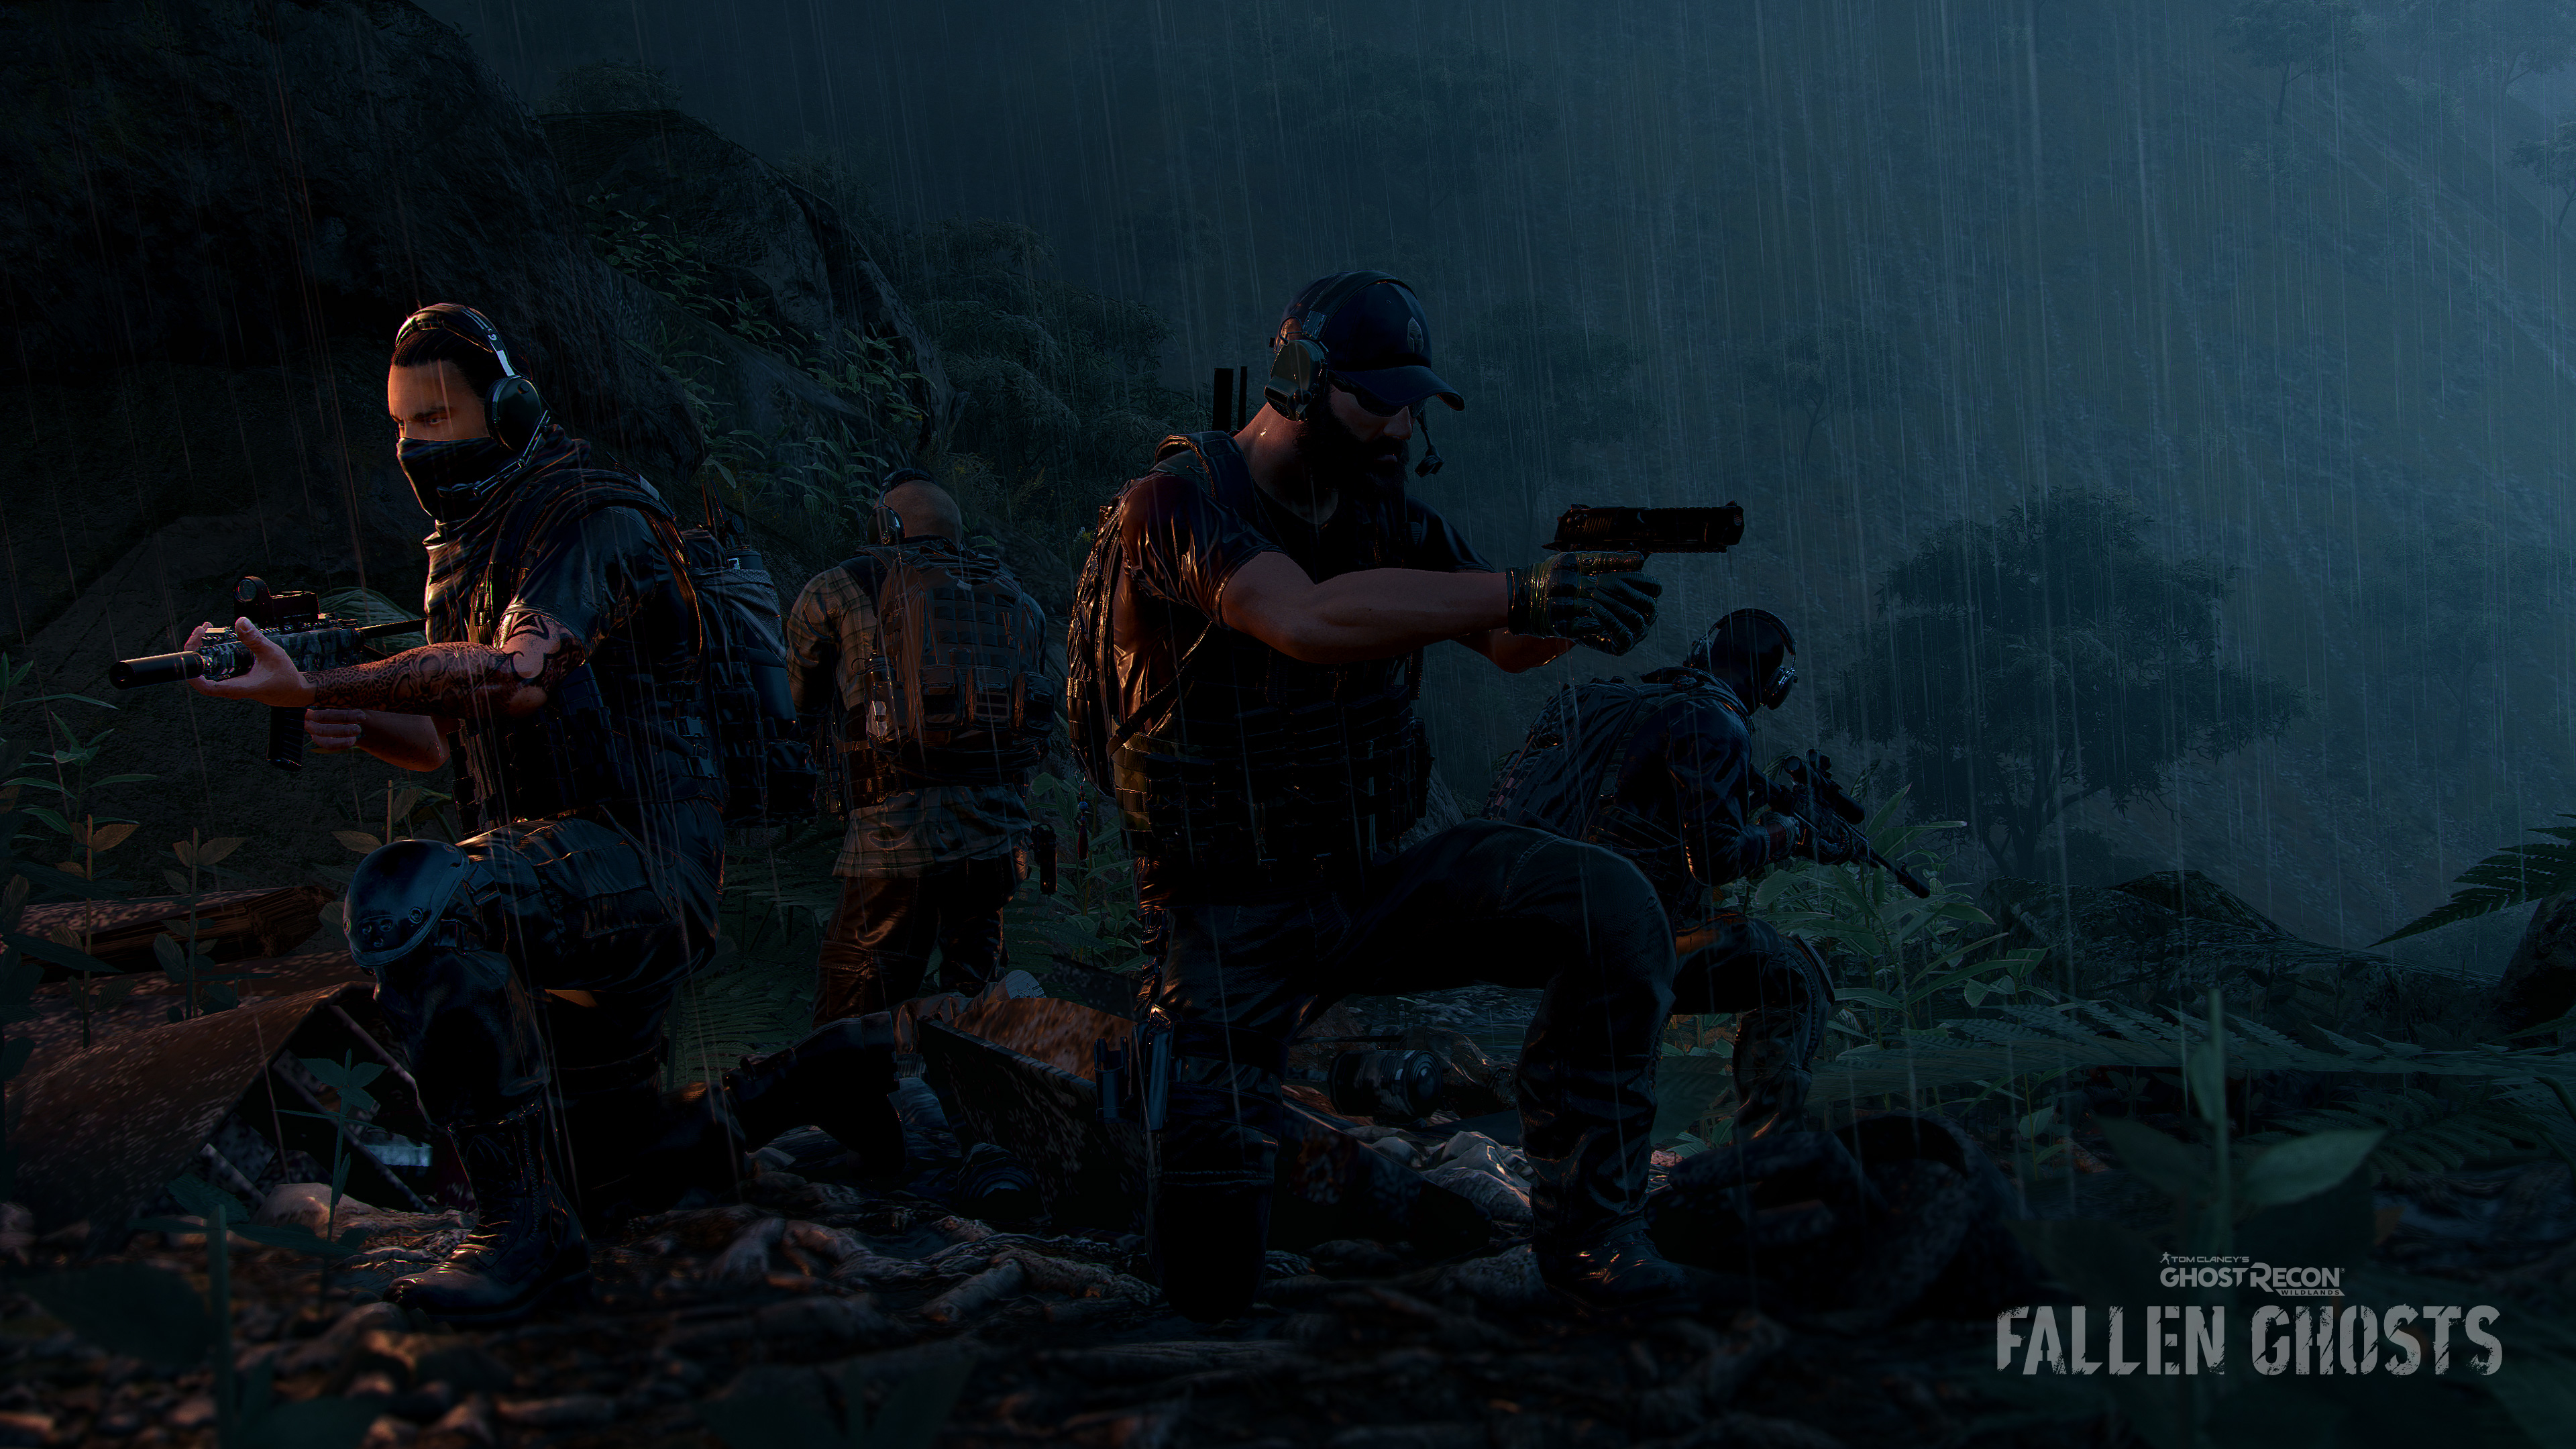 Tom Clancys Ghost Recon Wildlands Fallen Ghosts Dlc Wallpaper Hd